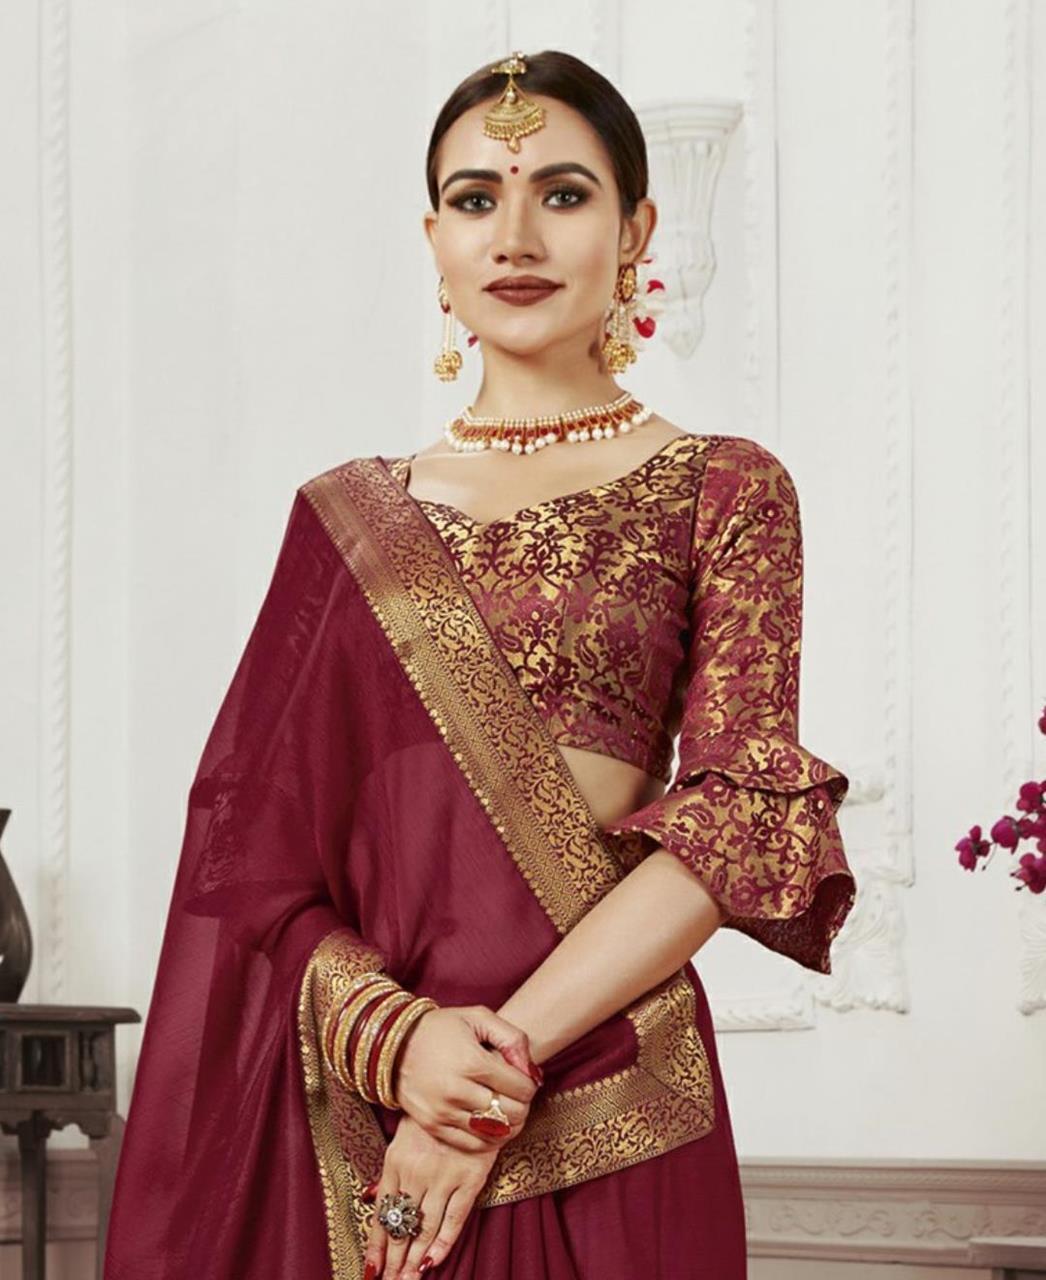 Woven Chiffon Saree (Sari) in Maroon